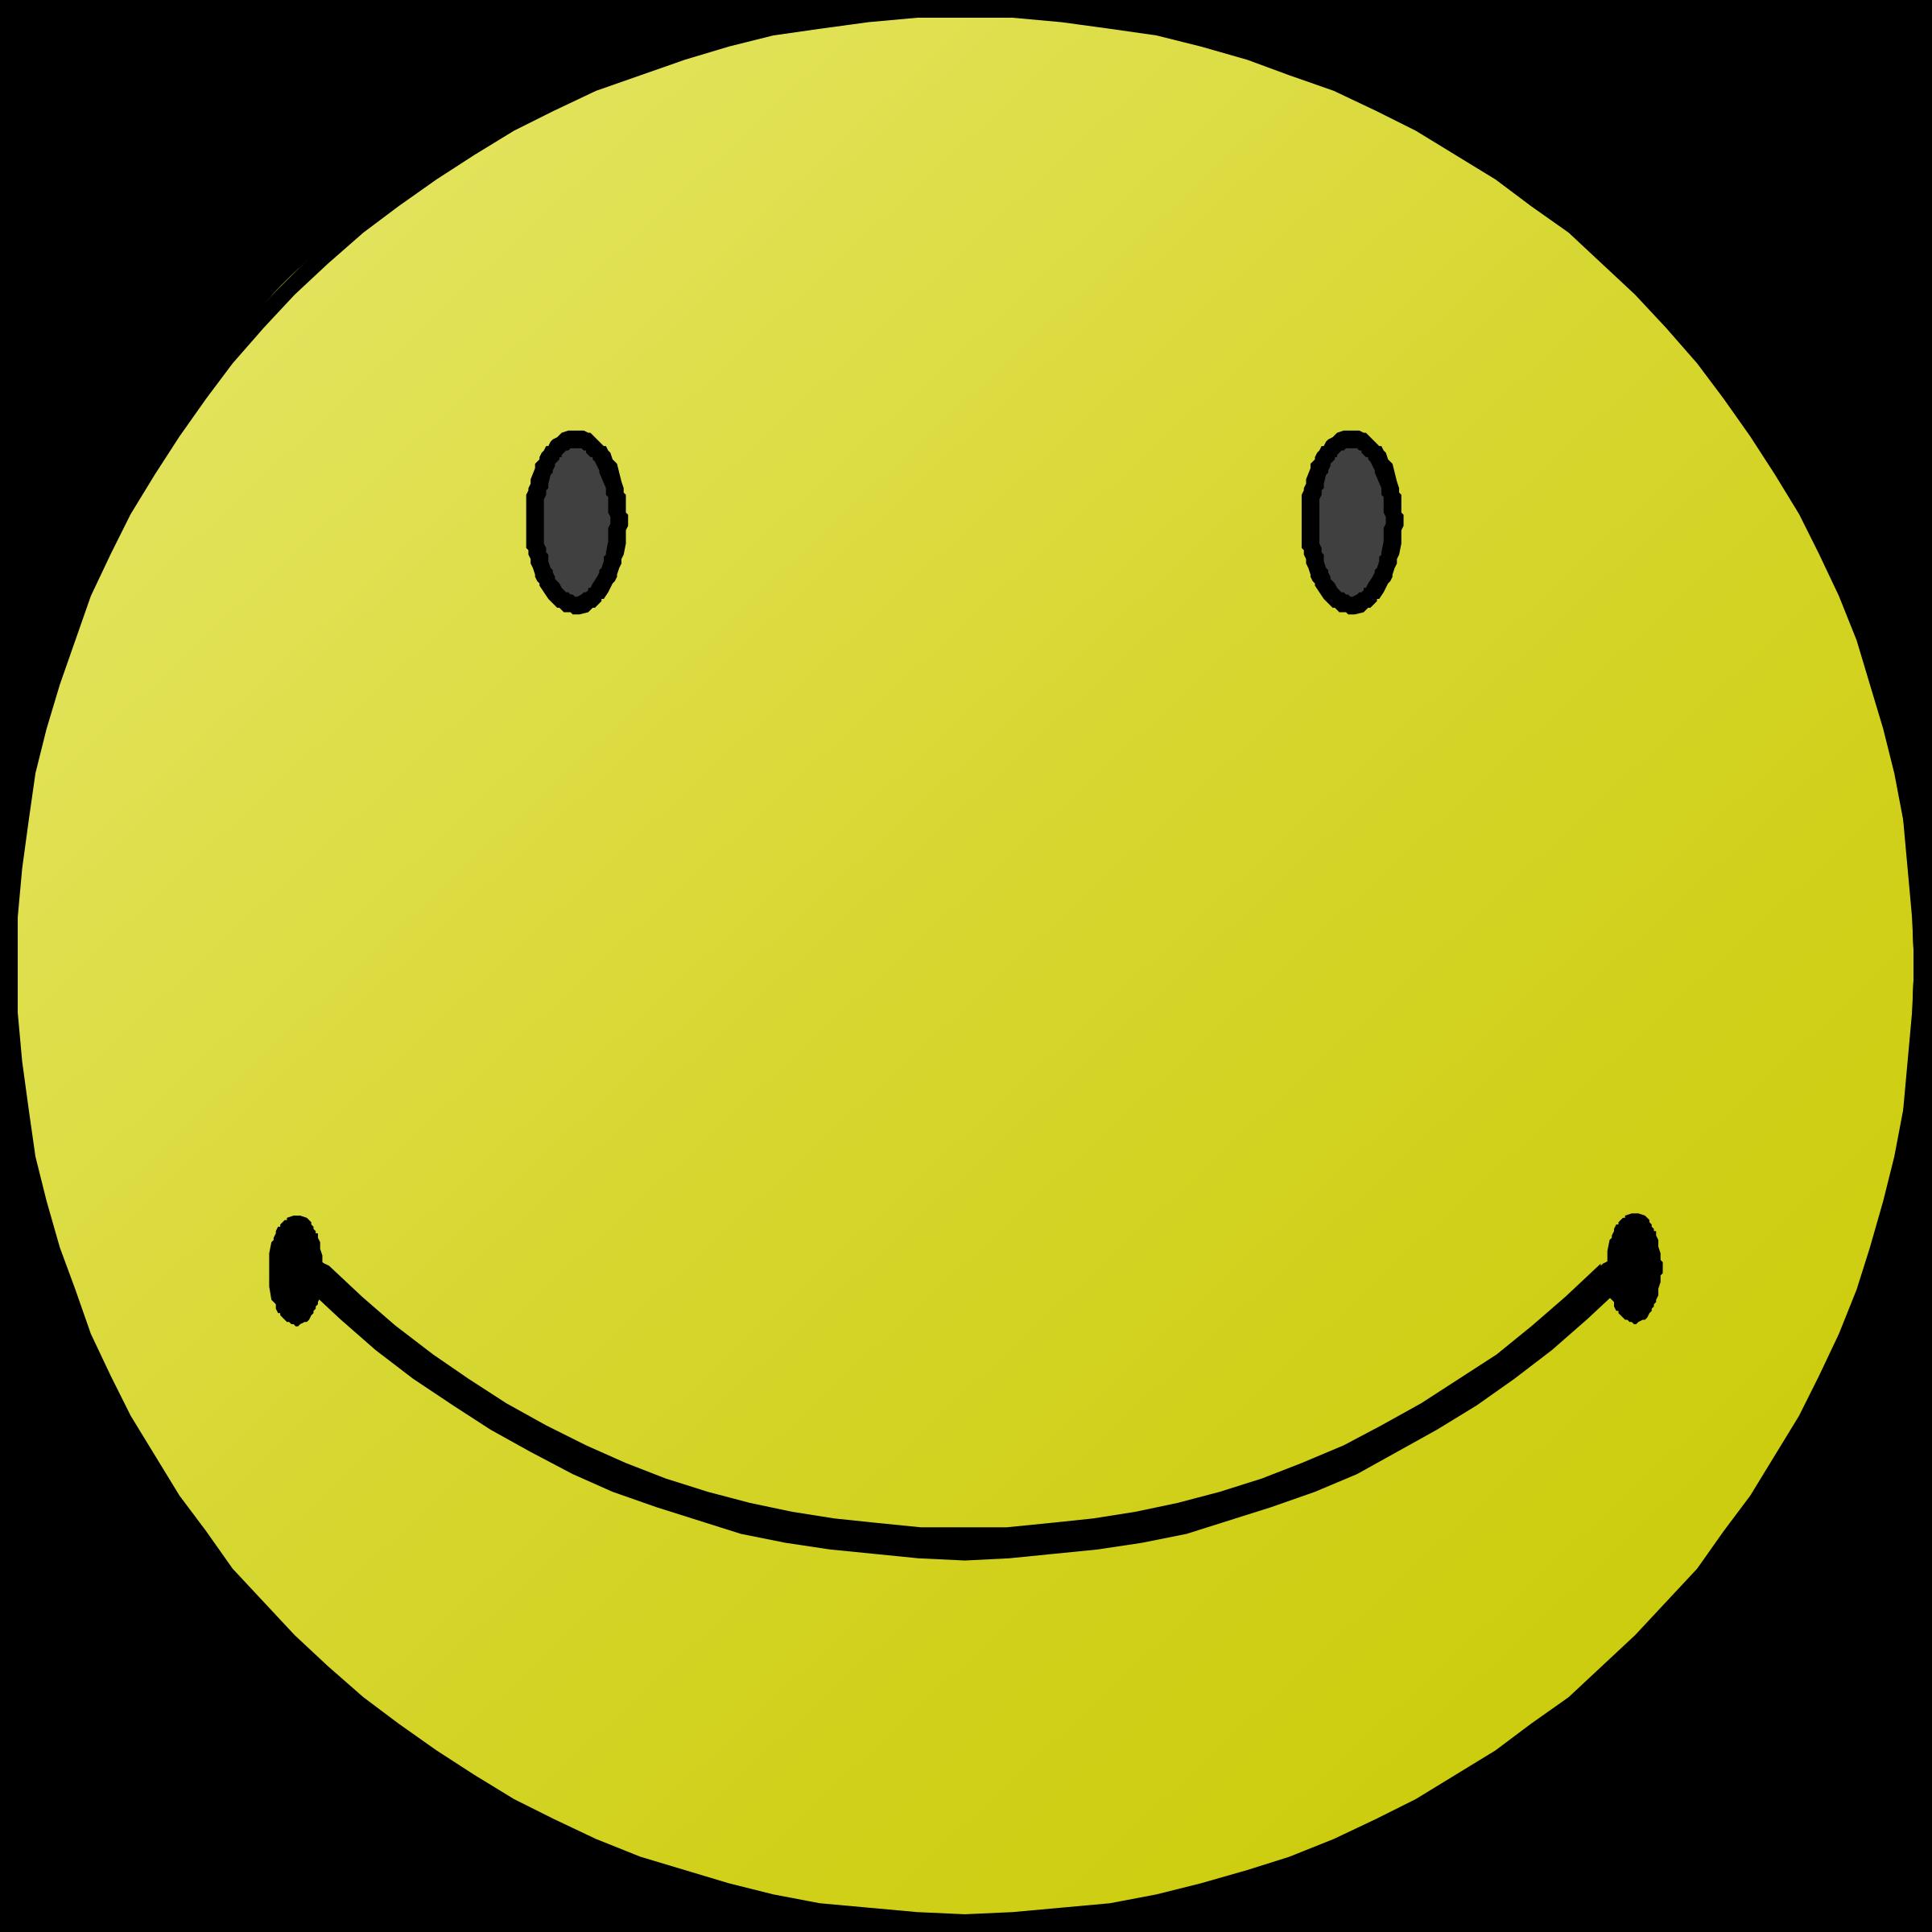 Happy day big image. Smiley clipart border